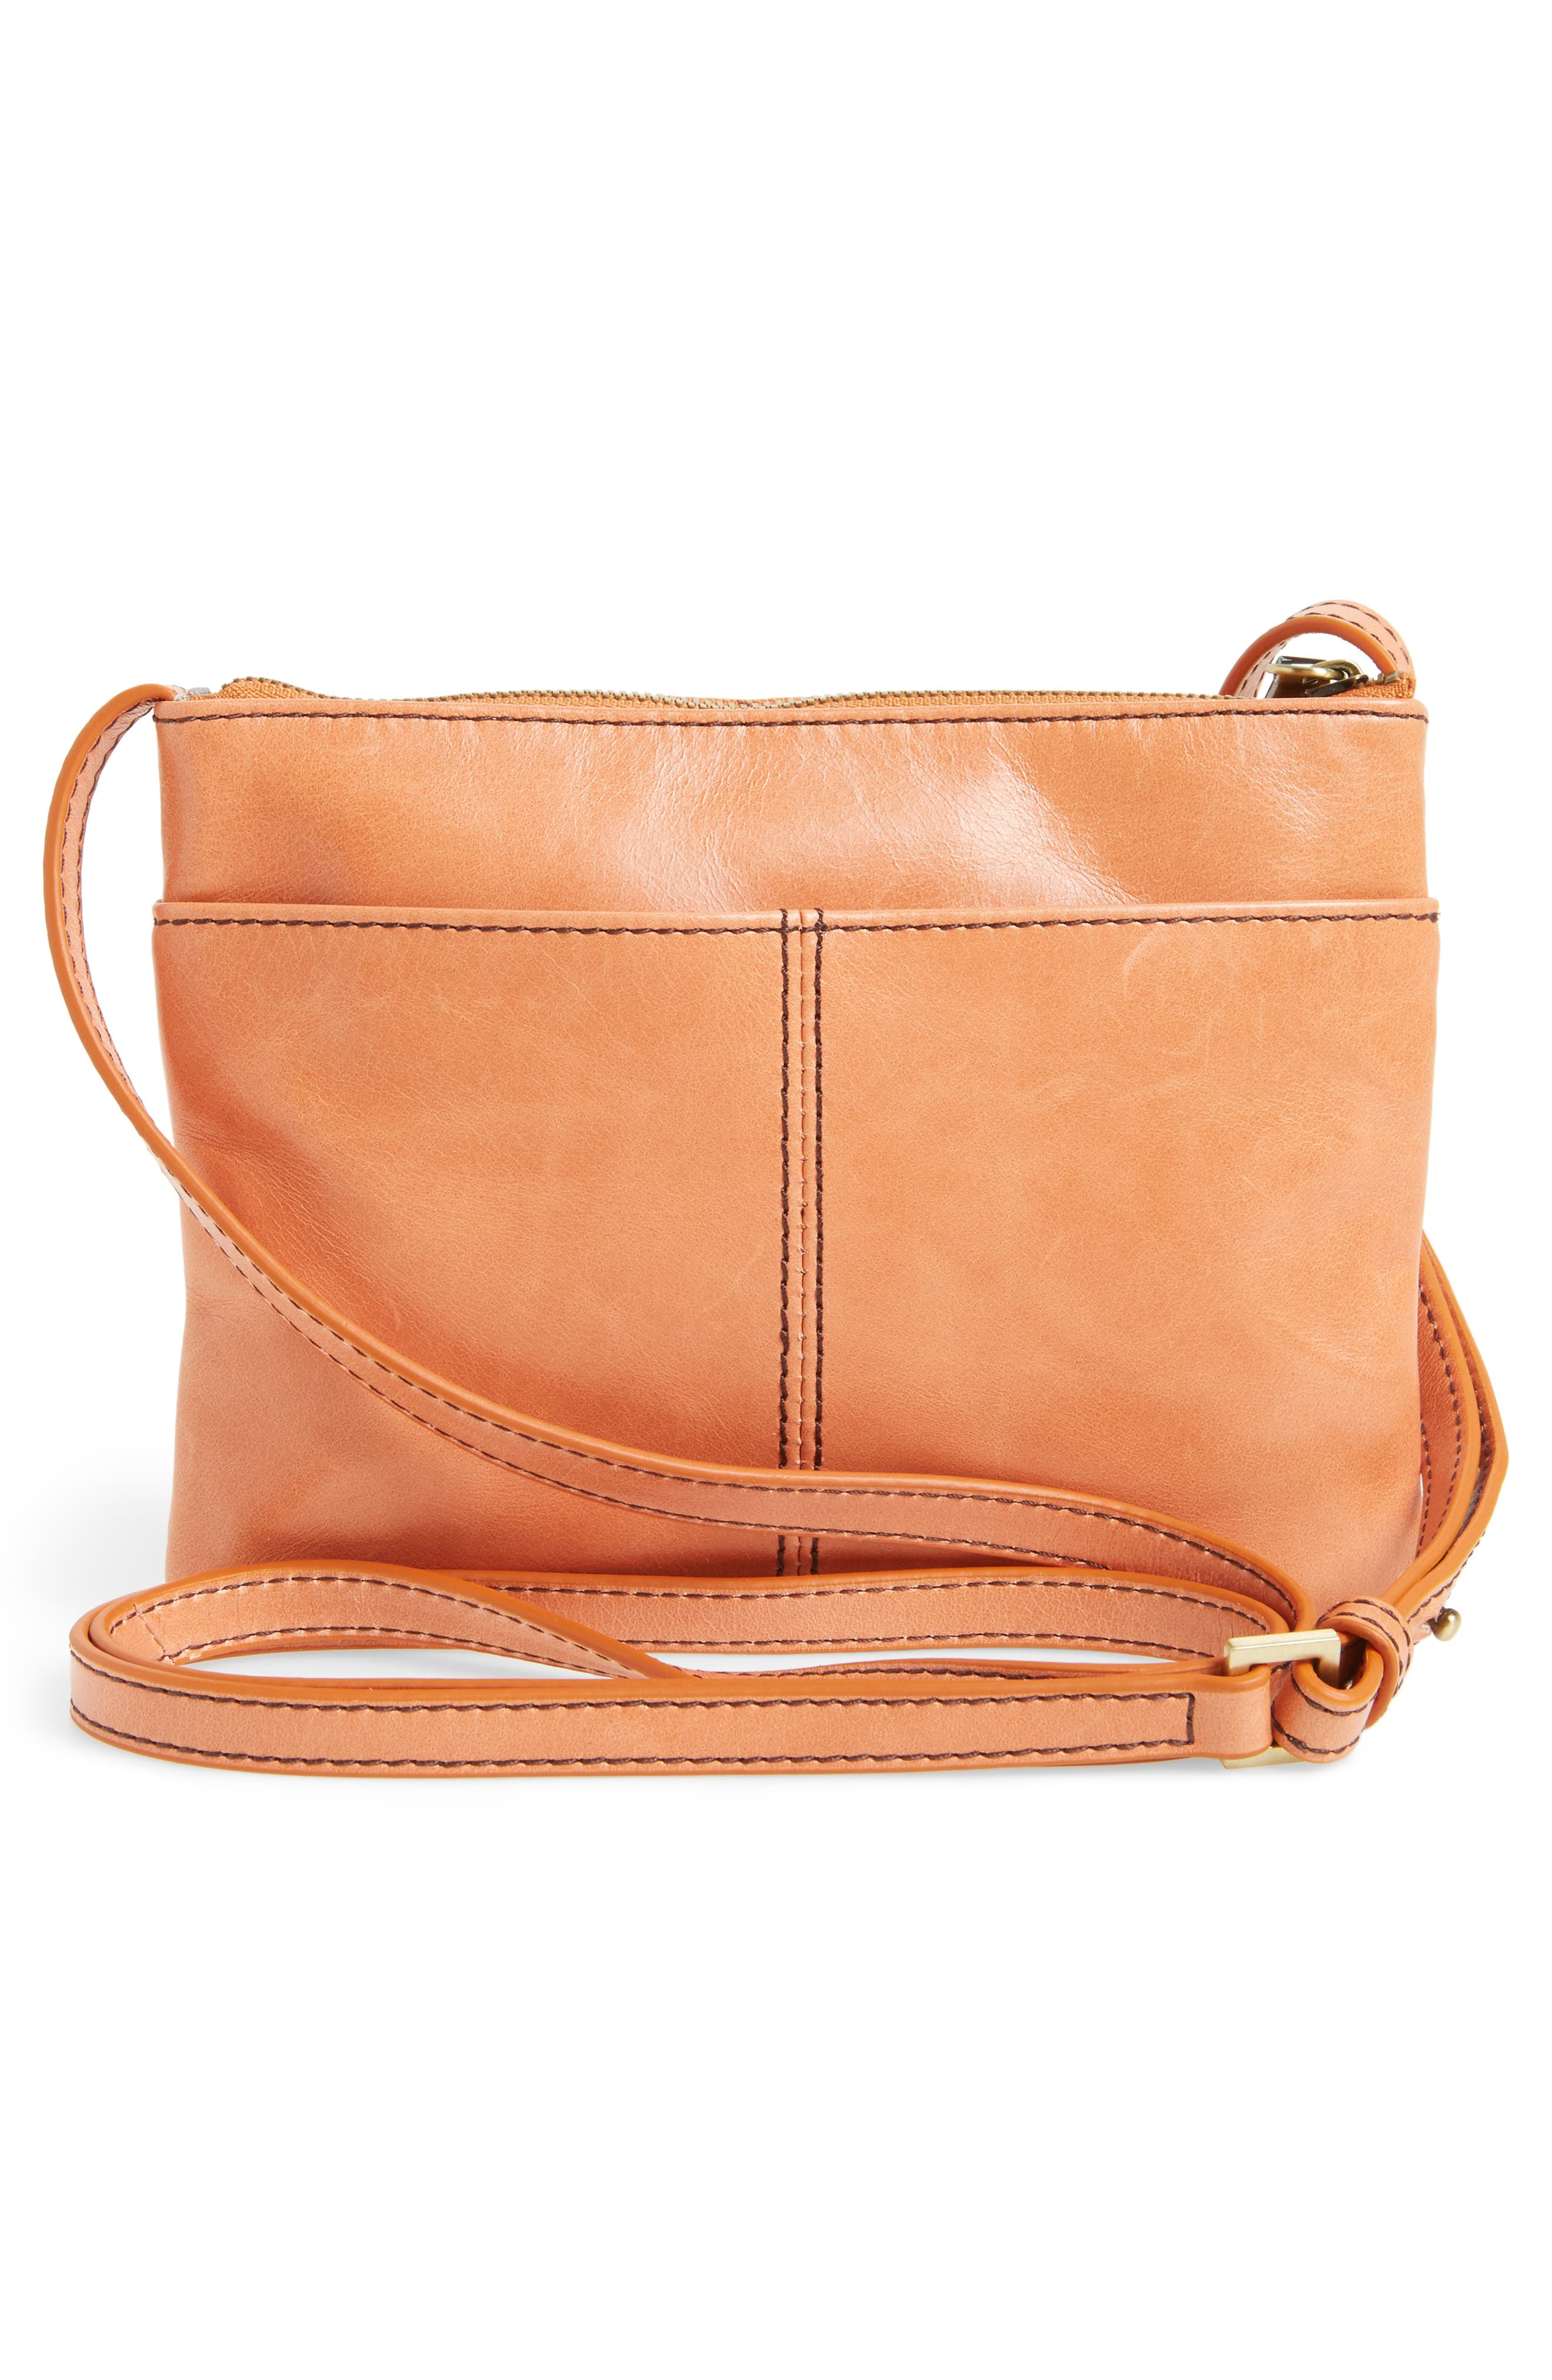 Amble Leather Crossbody Bag,                             Alternate thumbnail 33, color,